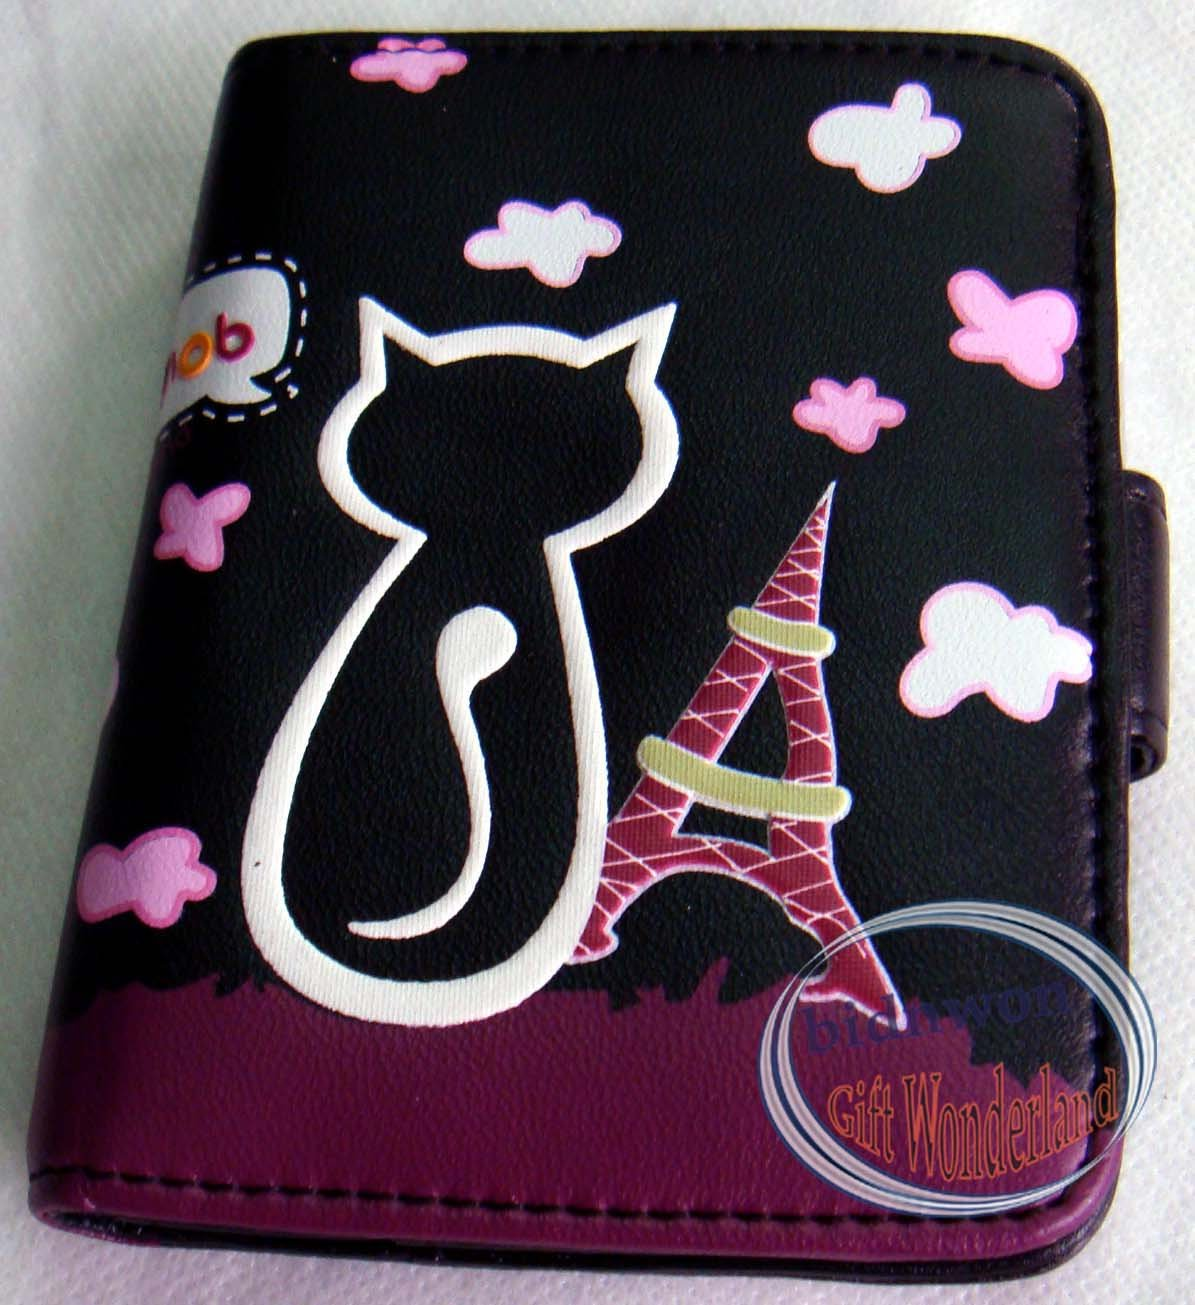 Stylish Cool Cat ID Credit Card Name Card Organizer Holder Black